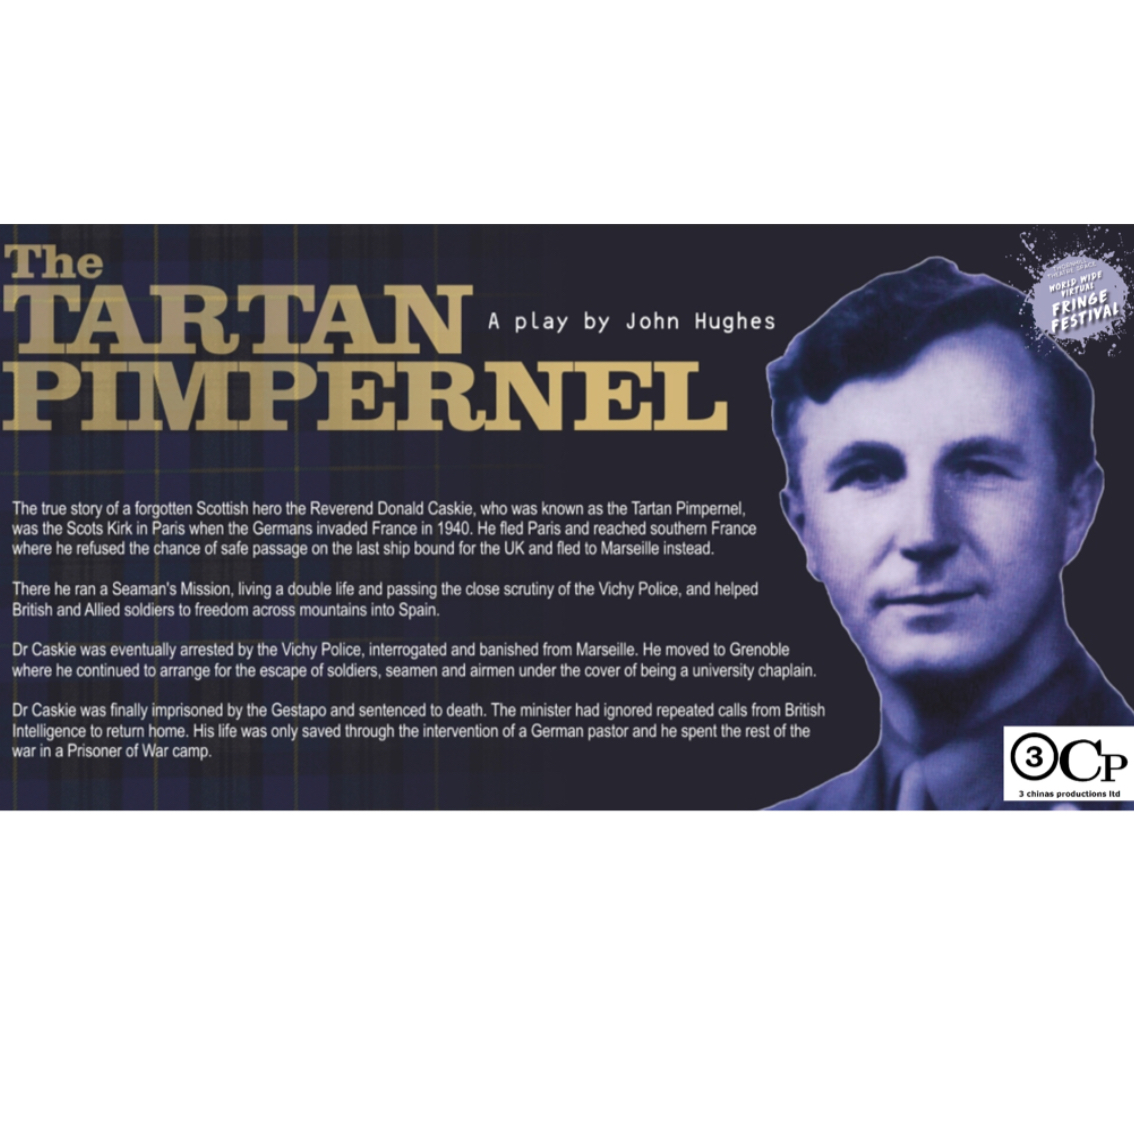 The Tartan Pimpernel Artwork